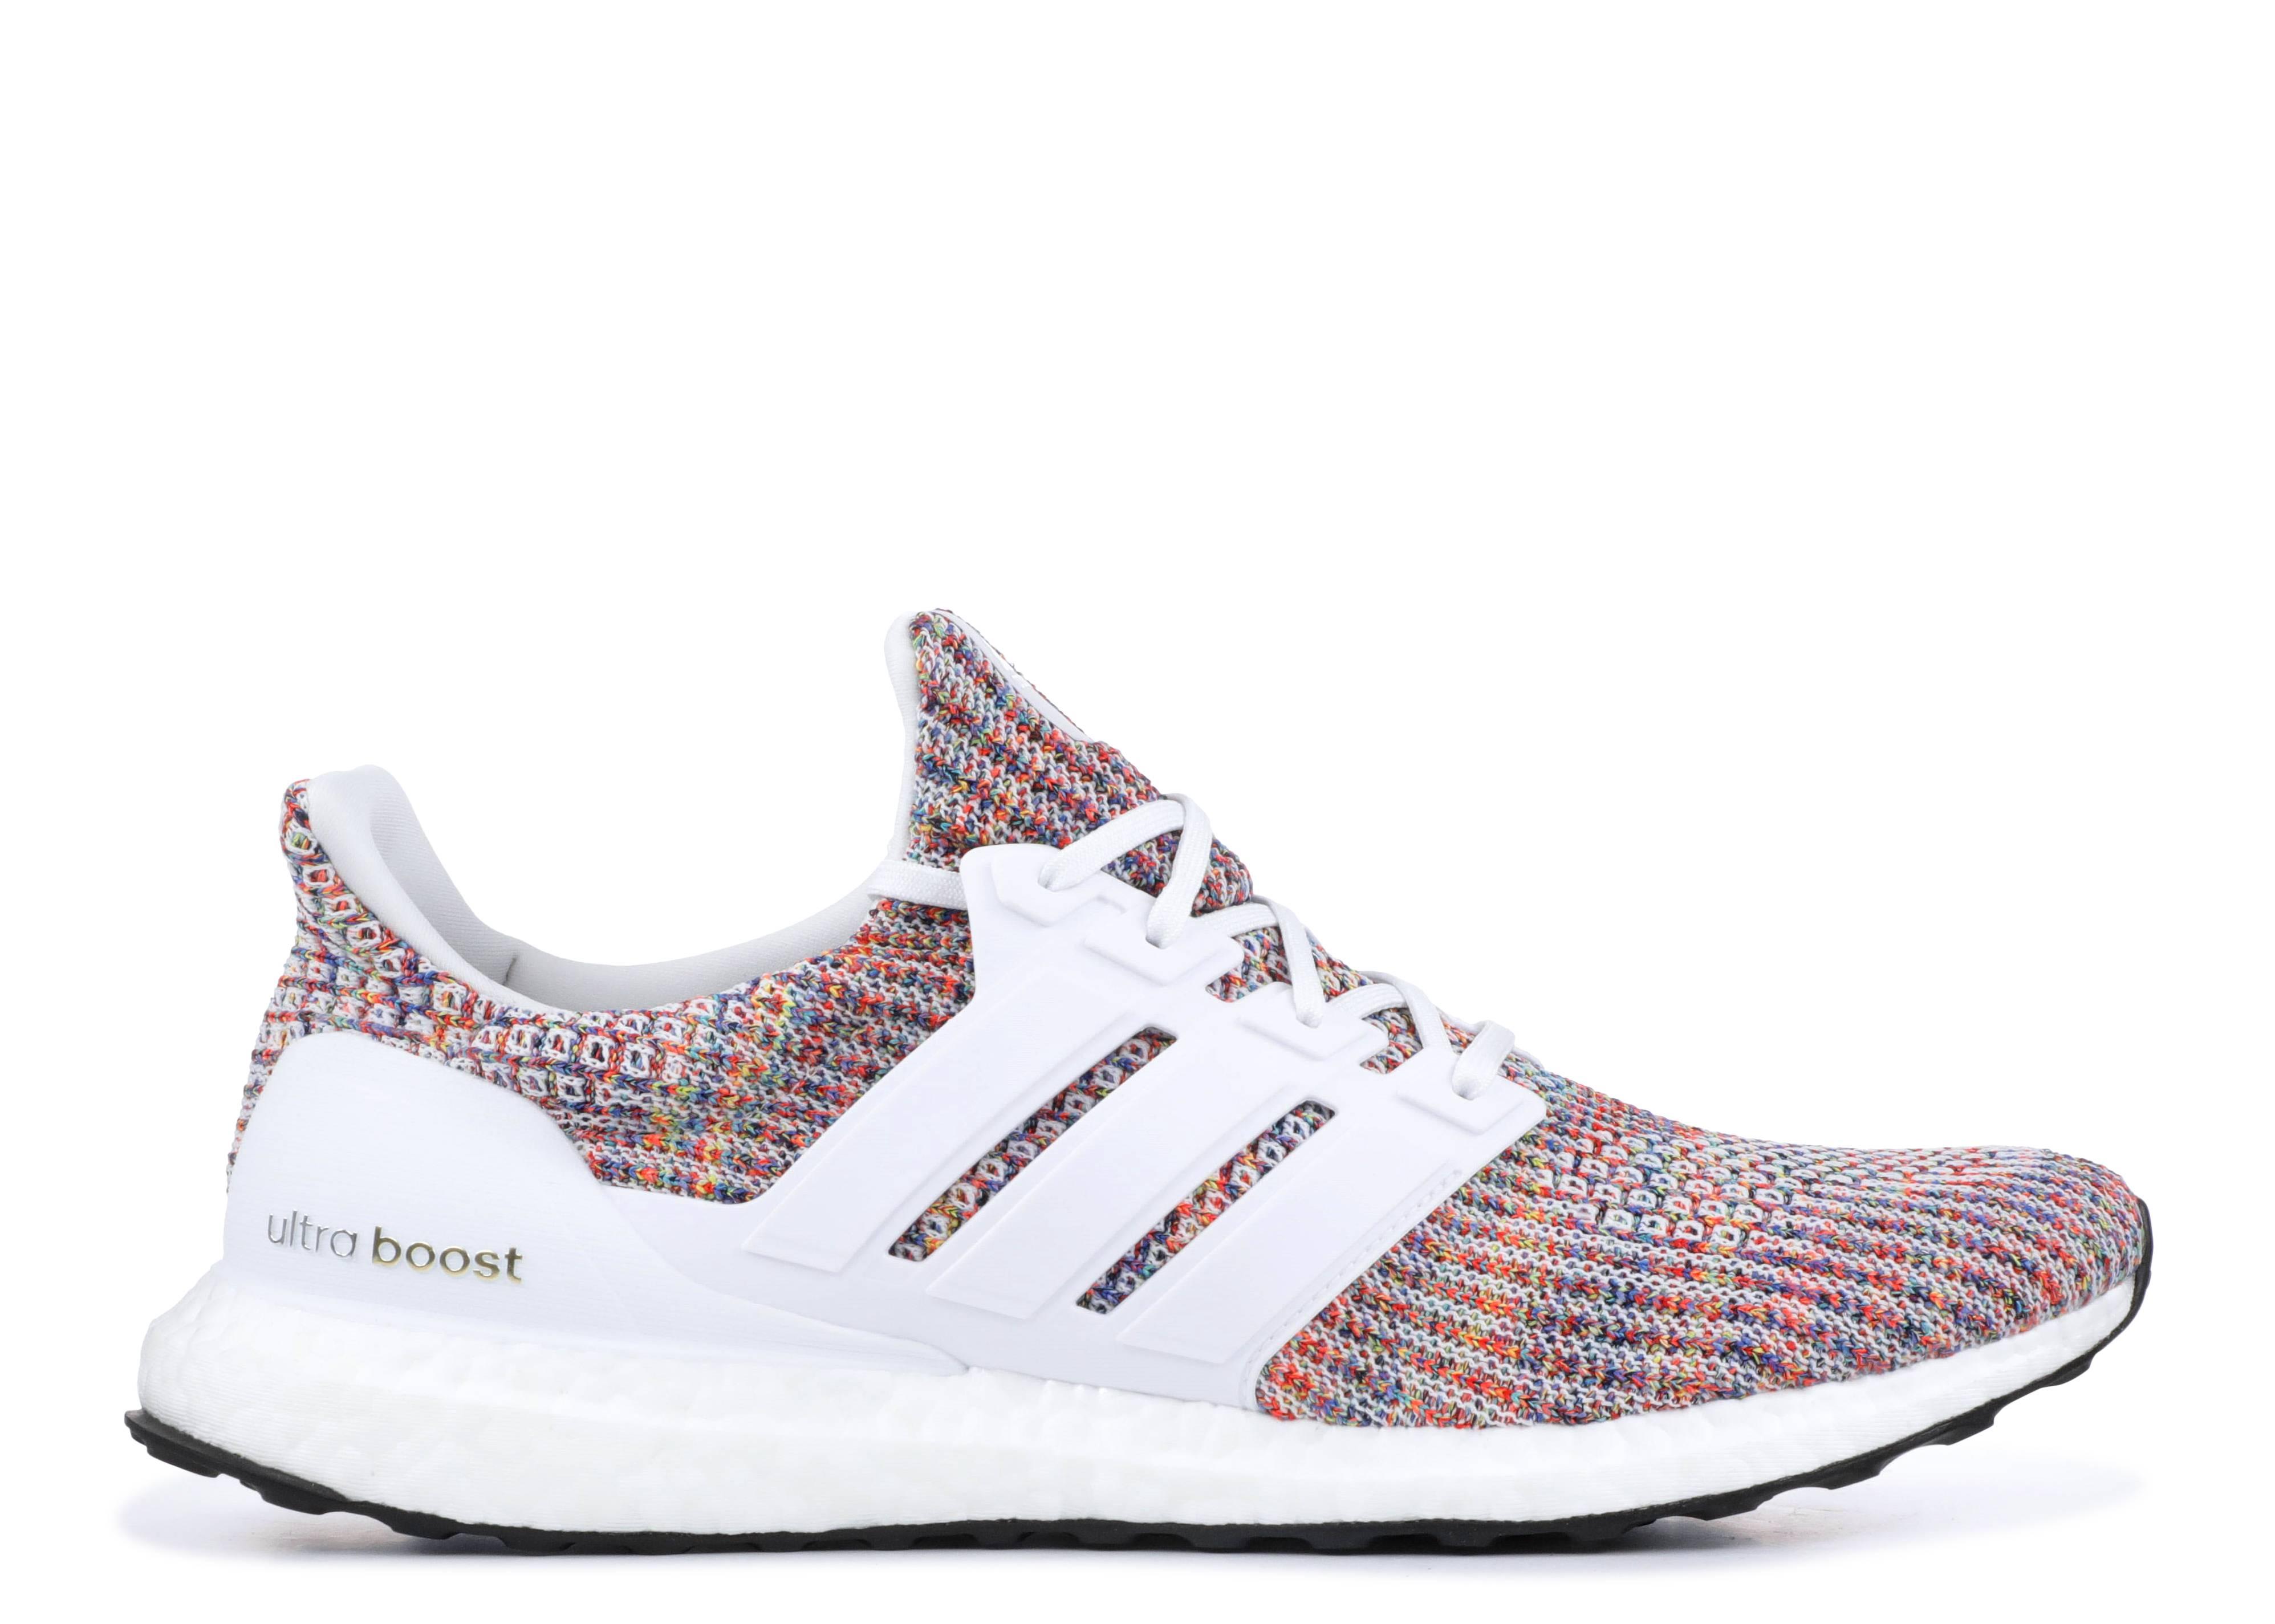 62ceb540c291c Adidas Ultra Boost - 3.0